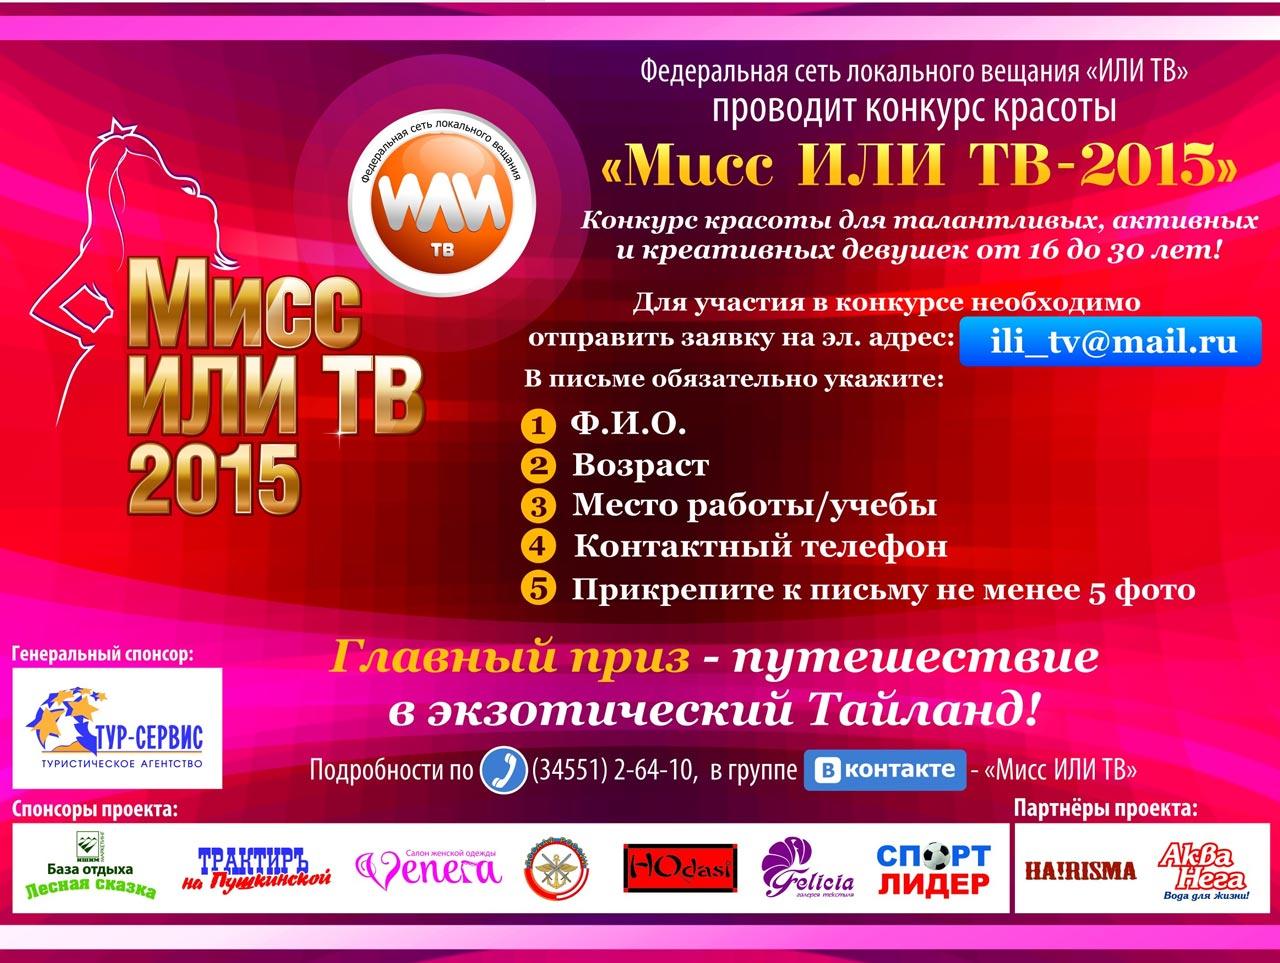 Мисс ИЛИ ТВ-2015